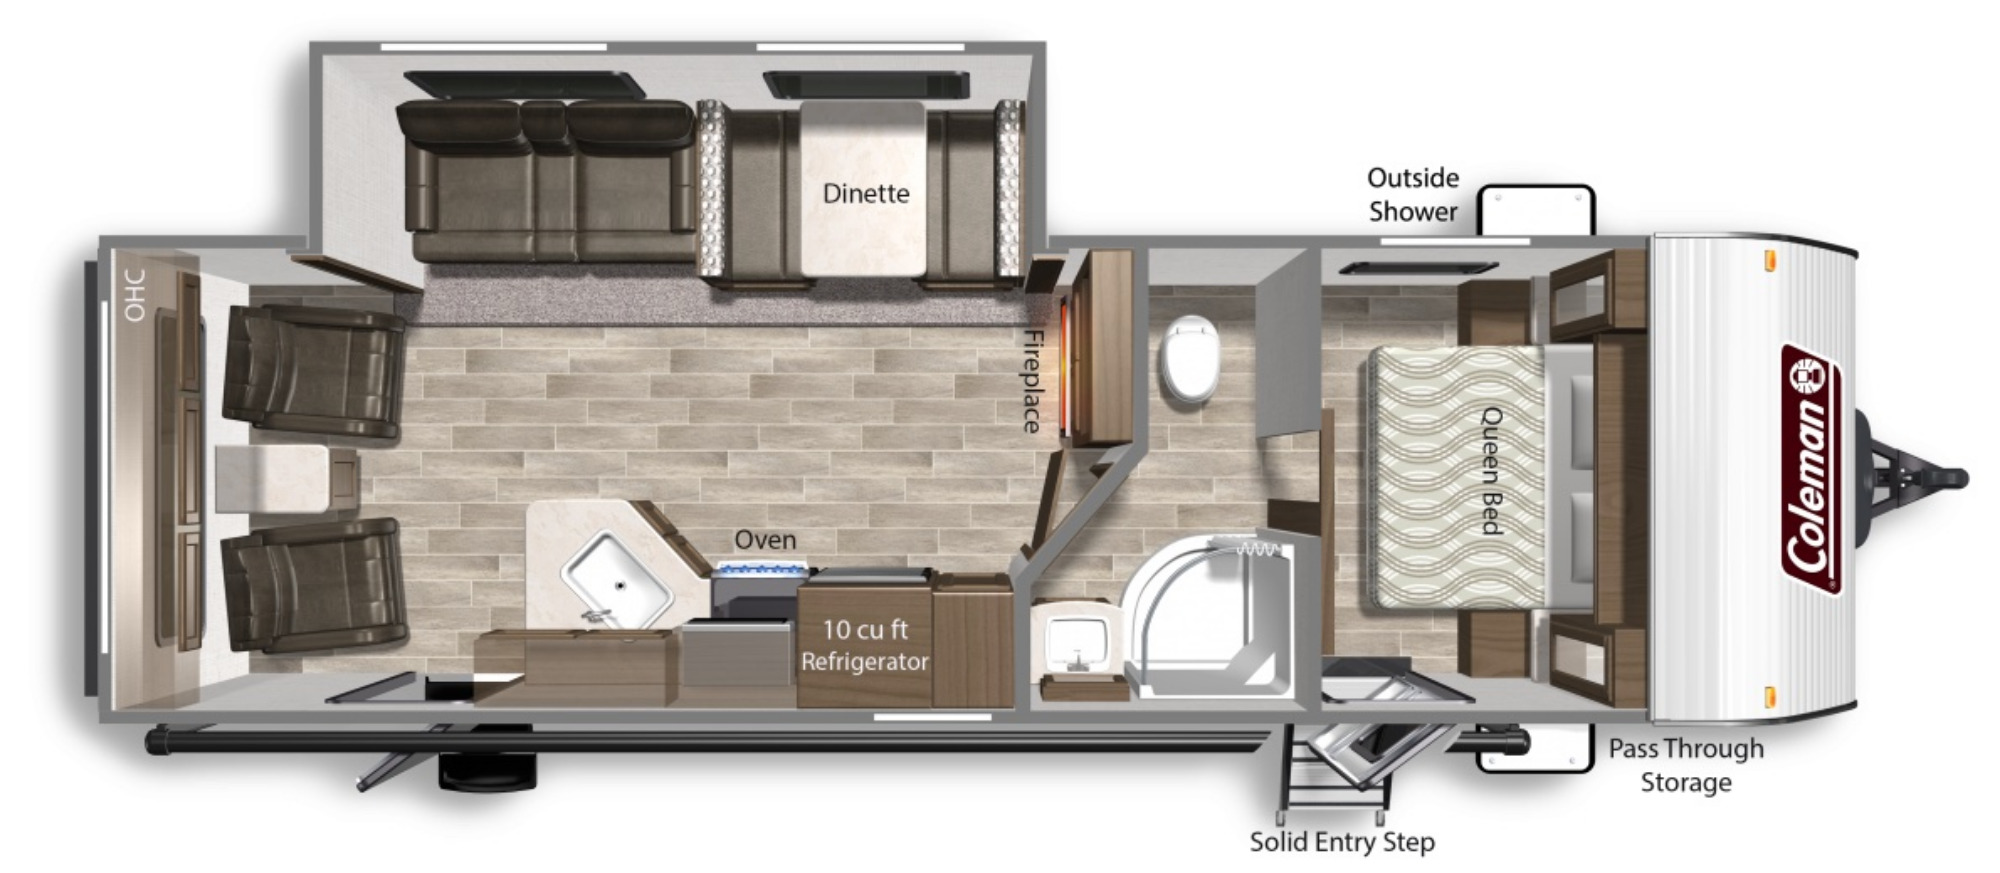 View Floor Plan for 2022 COLEMAN COLEMAN LANTERN 264RL